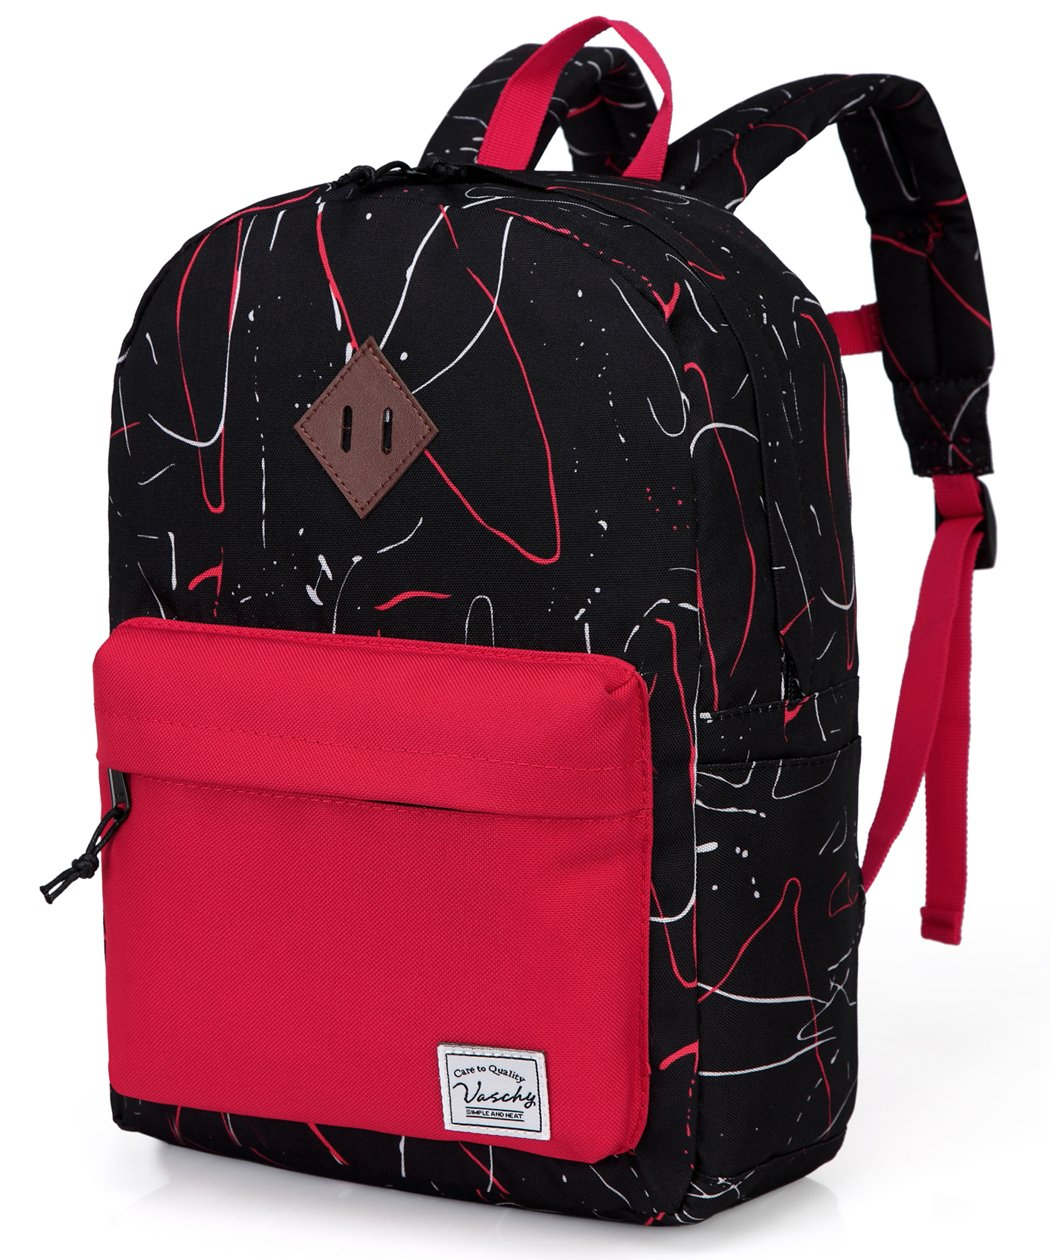 Preschool Toddler Backpack,Vaschy Little Kid Small Backpacks for Kindergarten Children Boys and Girls with Chest Strap in Black Red by VASCHY